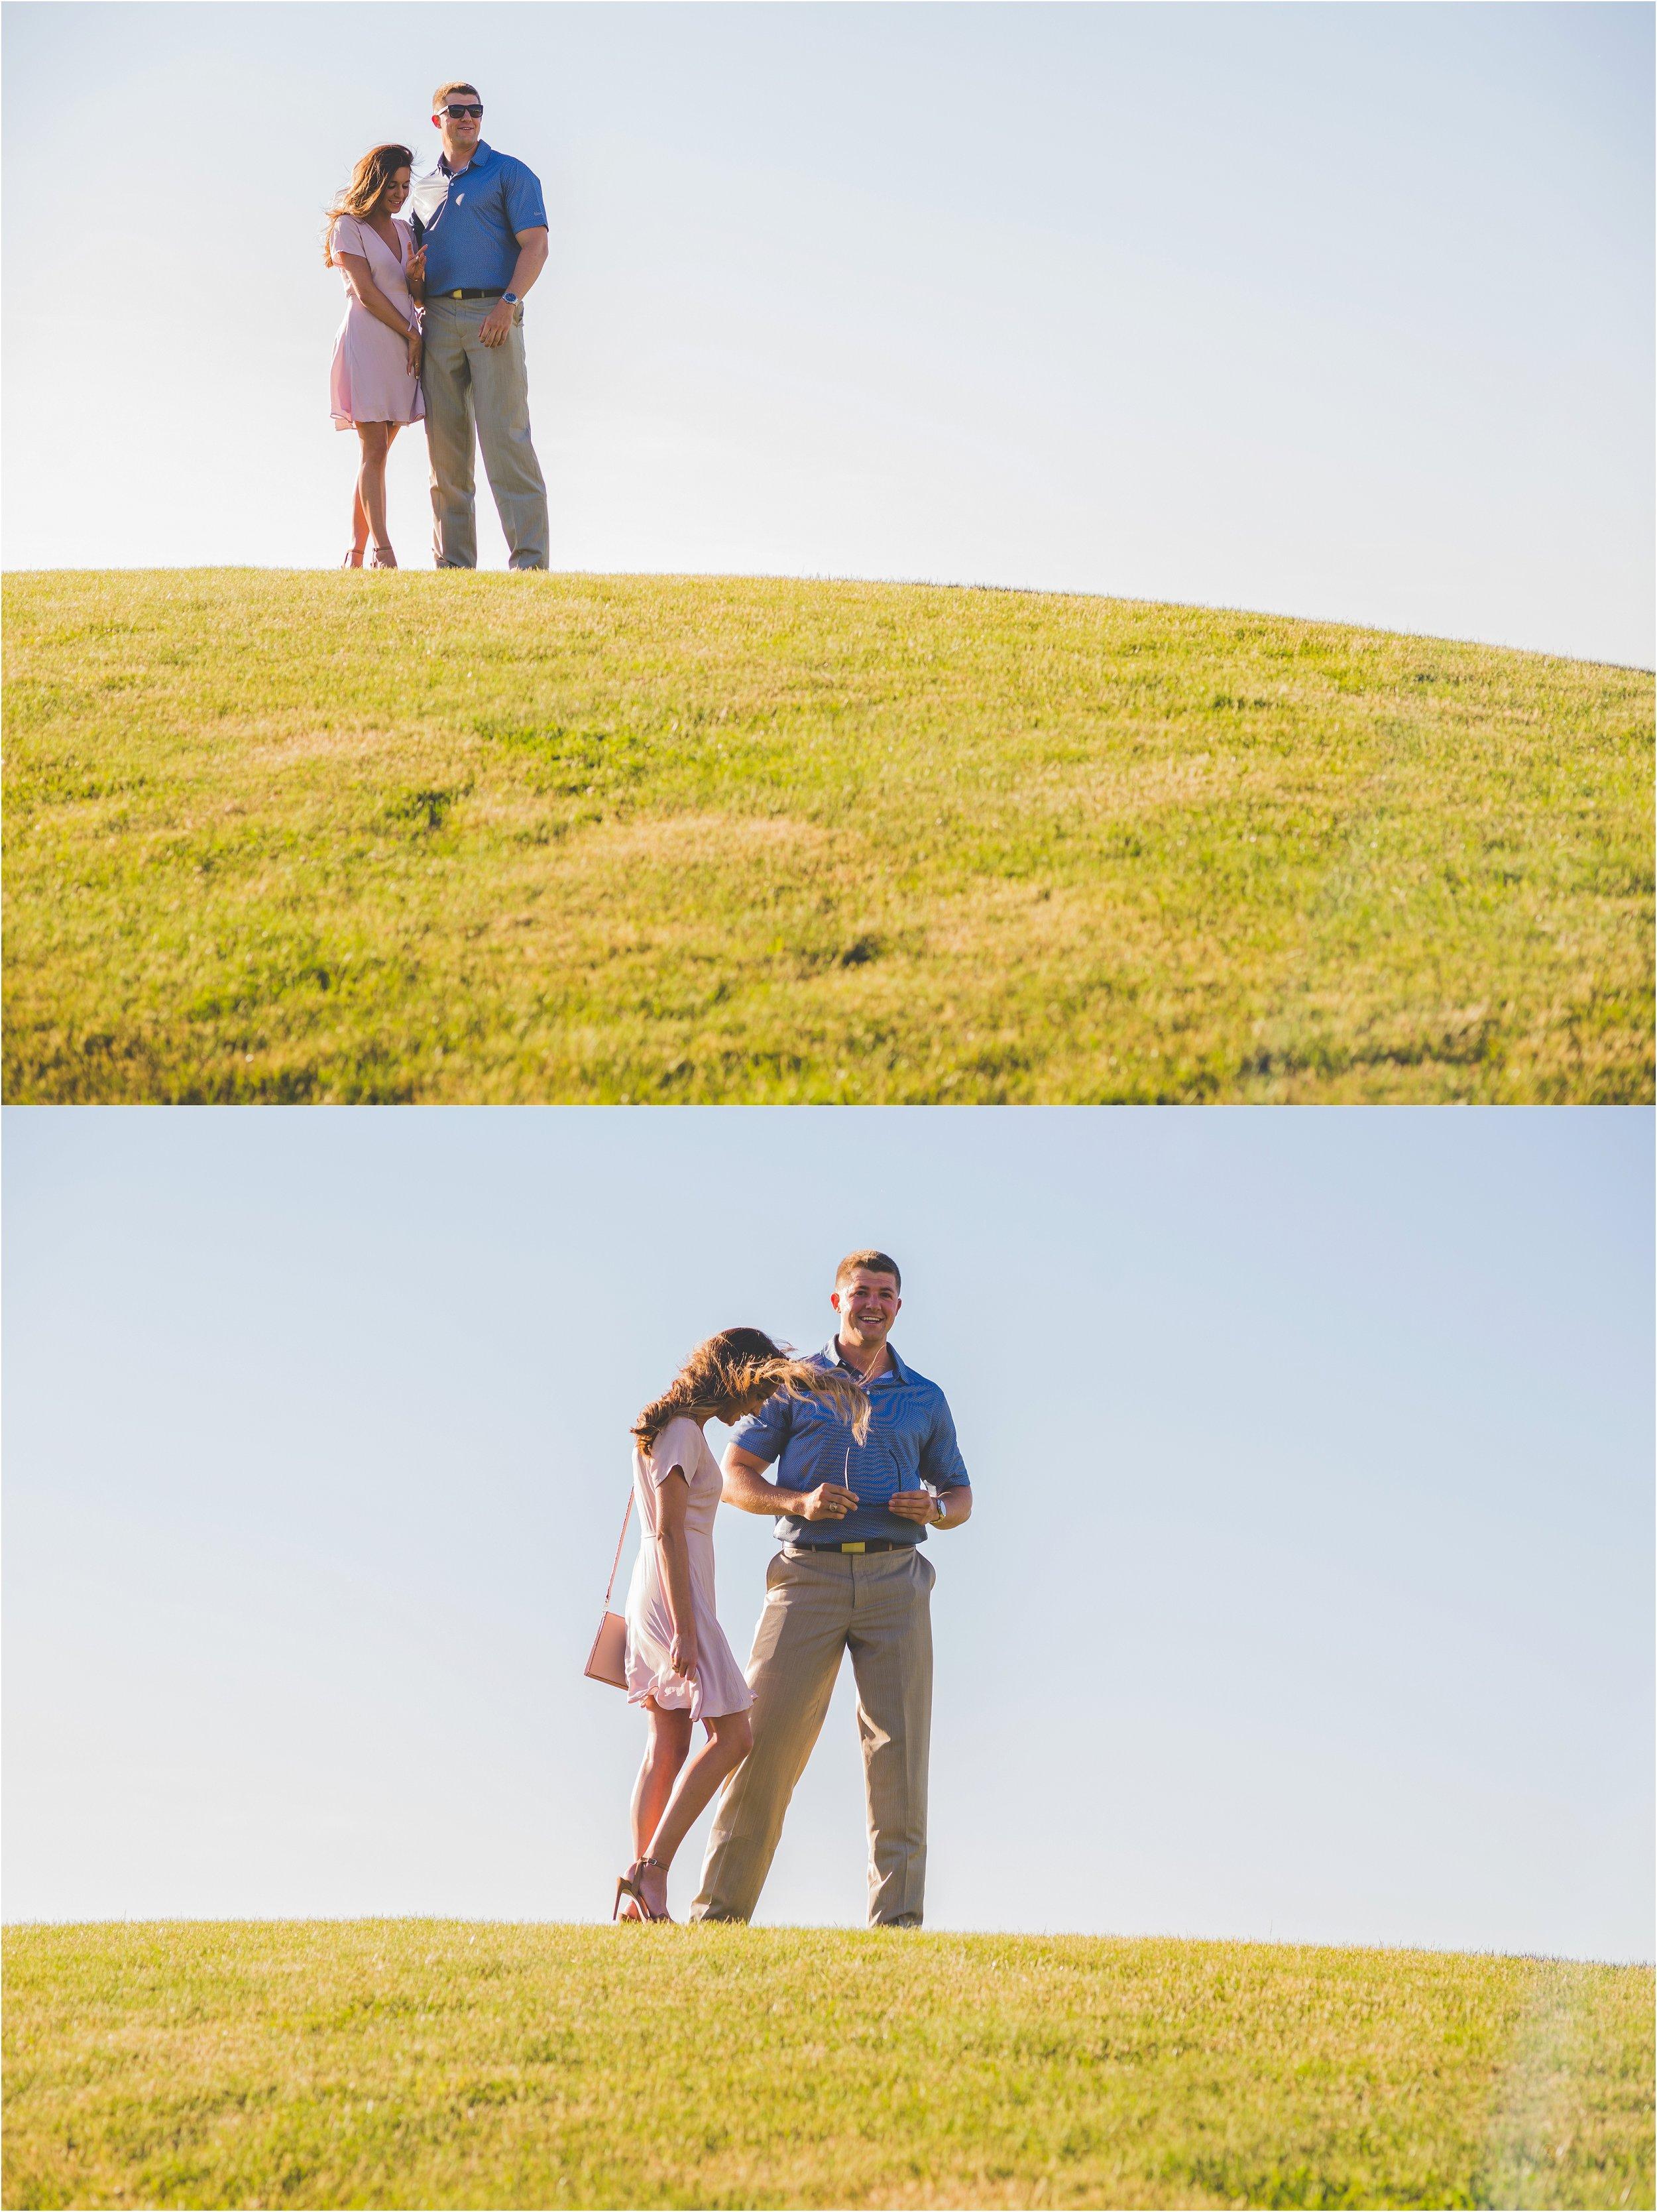 newcastle-golf-club-proposal-jannicka-mayte-seattle-washington-engagement-wedding-photographer_0010.jpg